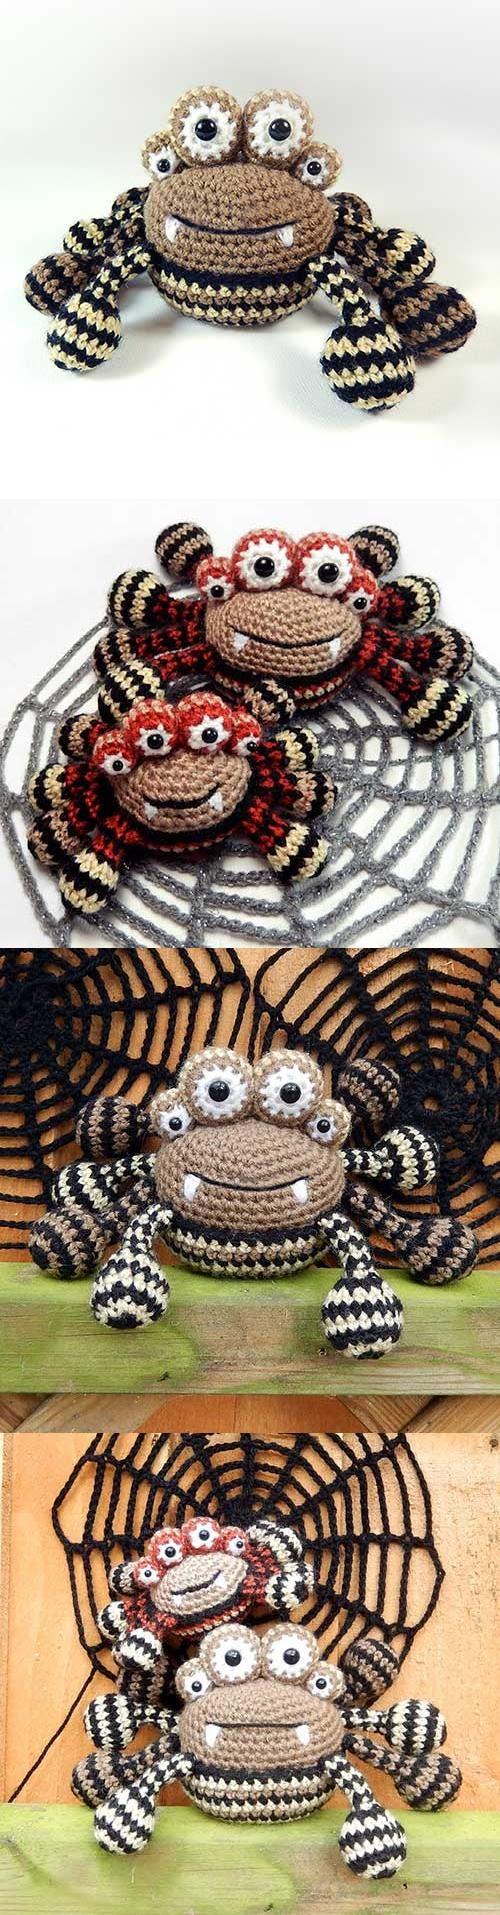 CROCHET - SPIDER WITH 4 EYES / ARAIGNEE AVEC 4 YEUX / SPIN MET 4 OGEN - Araña de 4 ojos